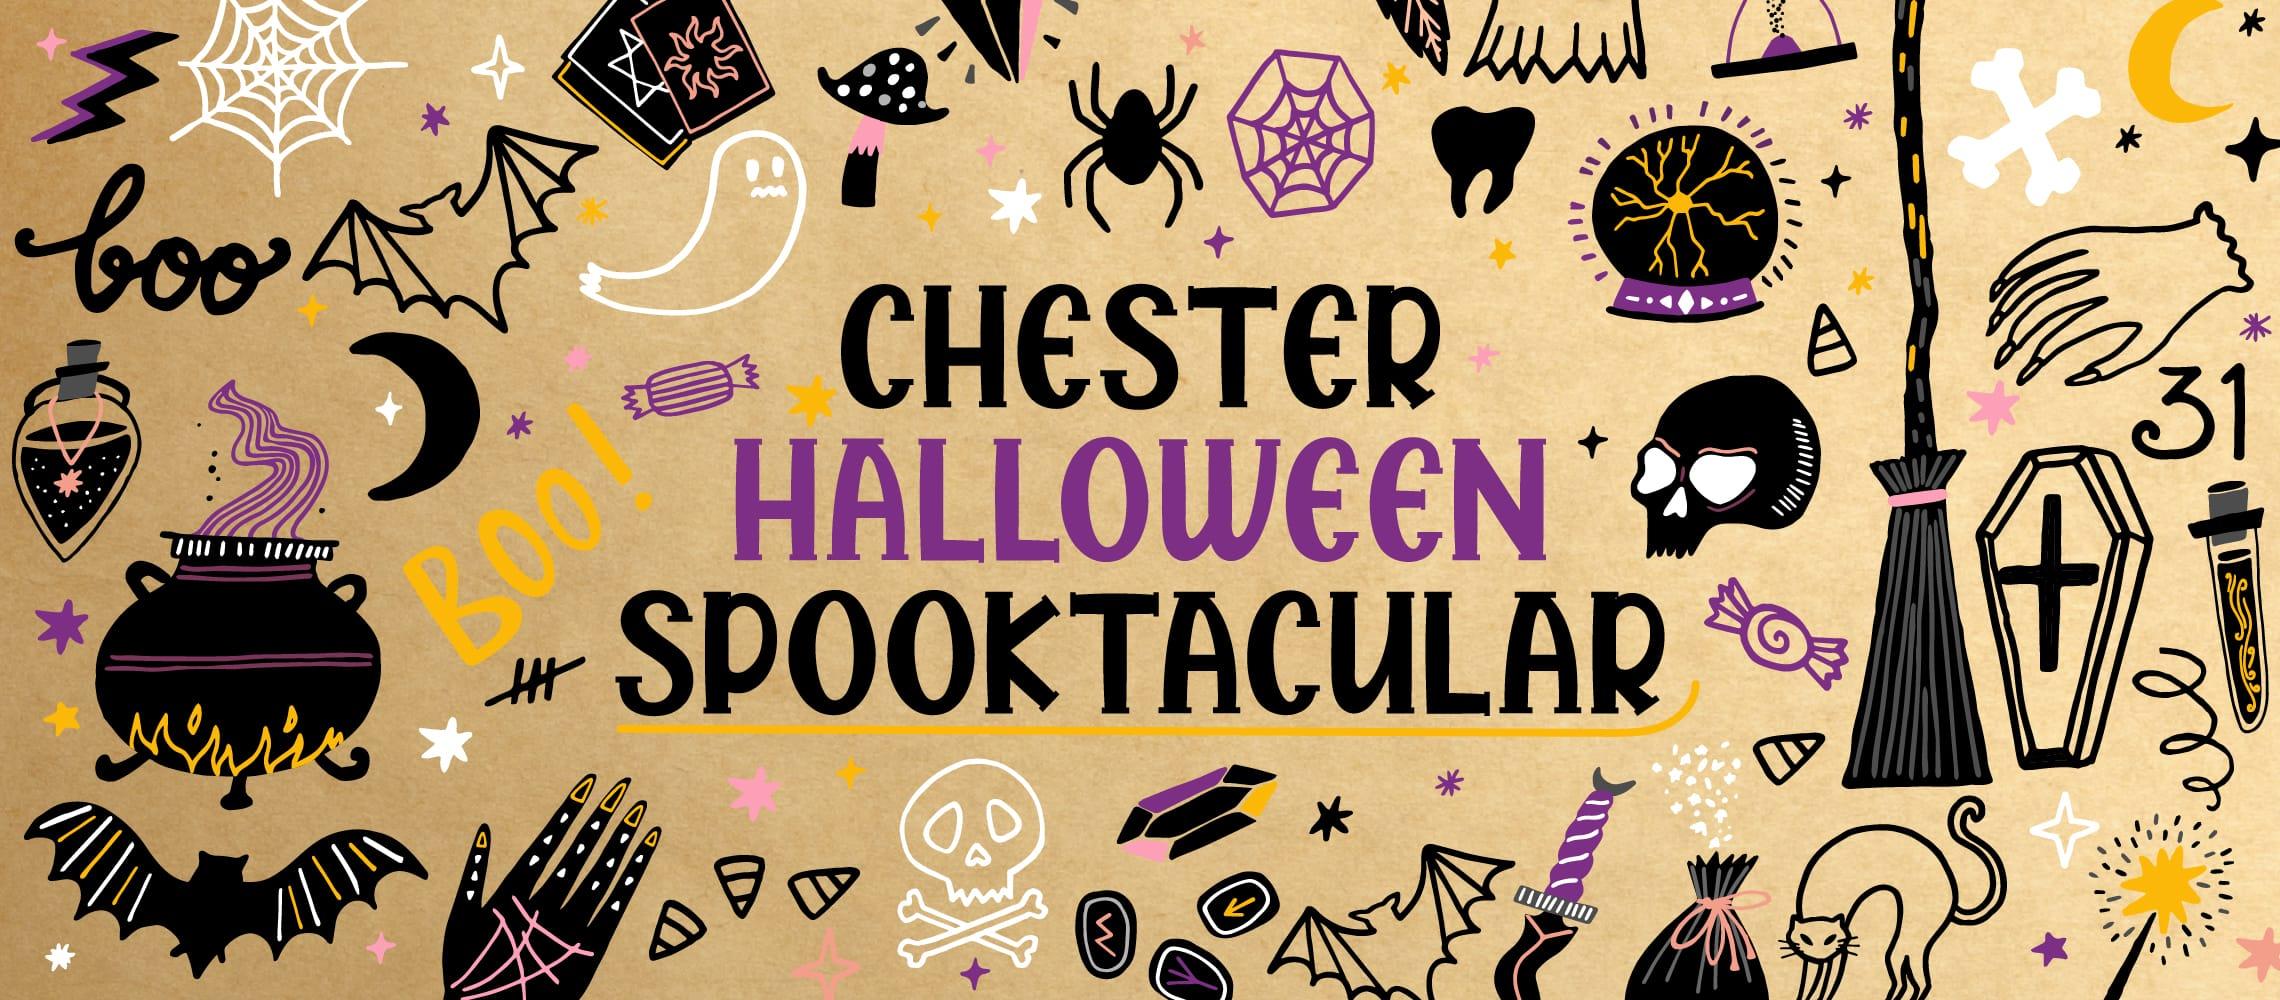 Chester Halloween Spooktacular